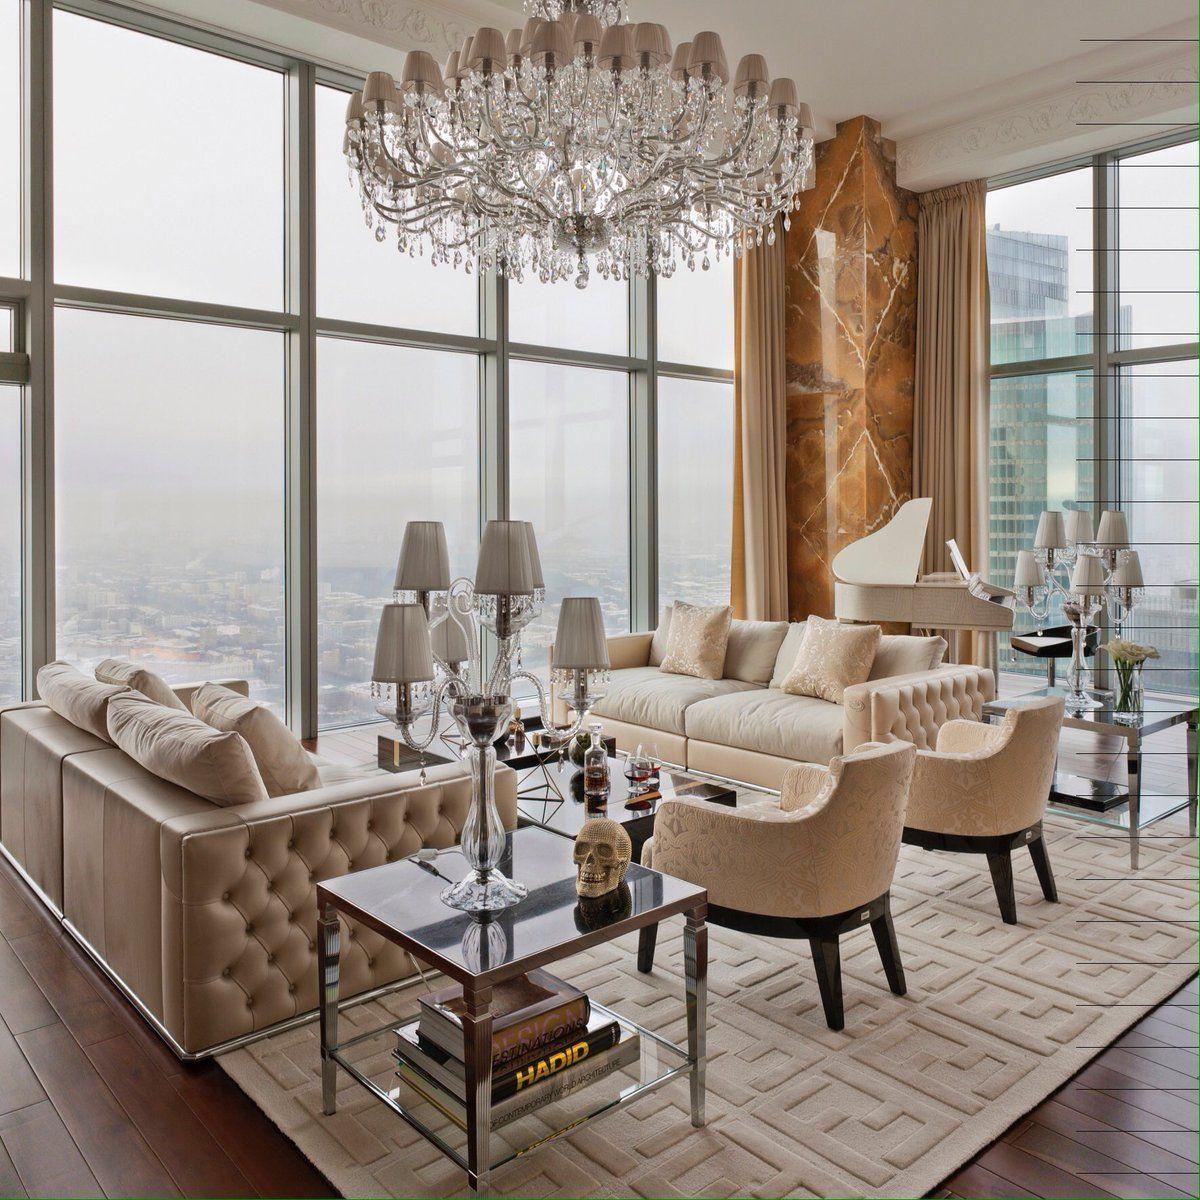 Modern Glam Living Room Decorating Ideas 19: 39 Incredible Coastal Glam Interior Design And Decor Ideas